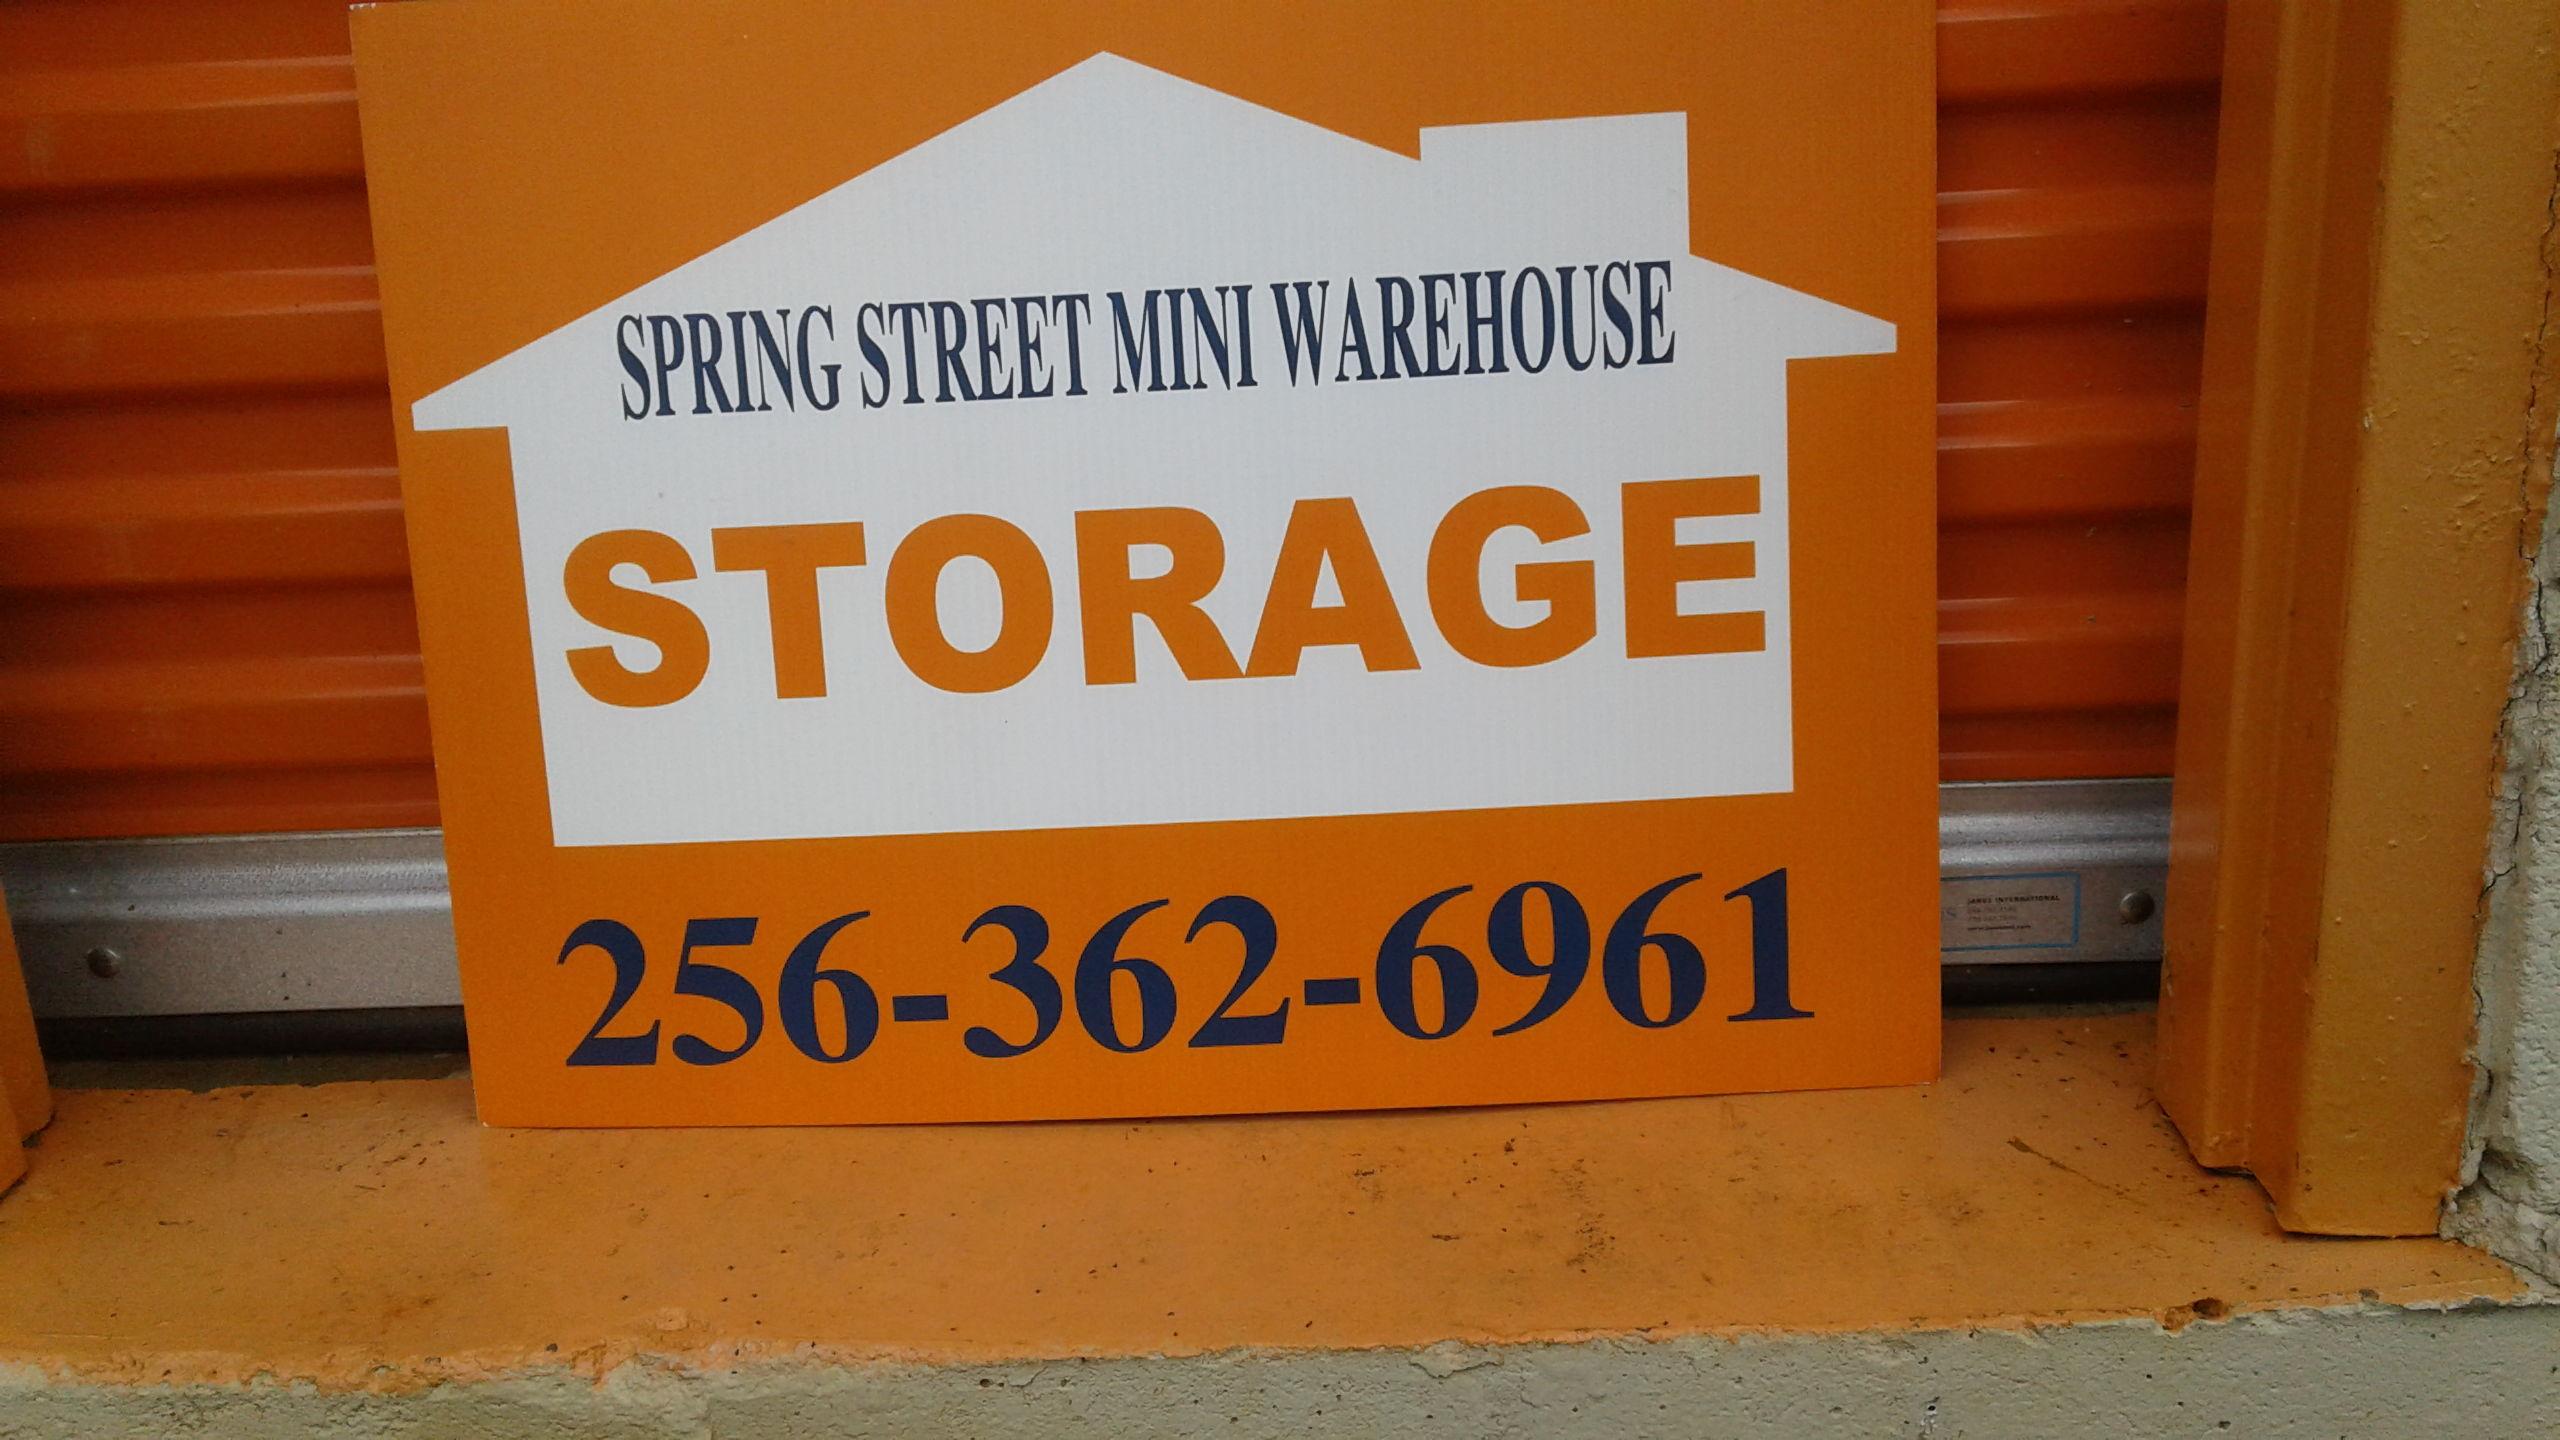 Spring Street Mini Warehouse